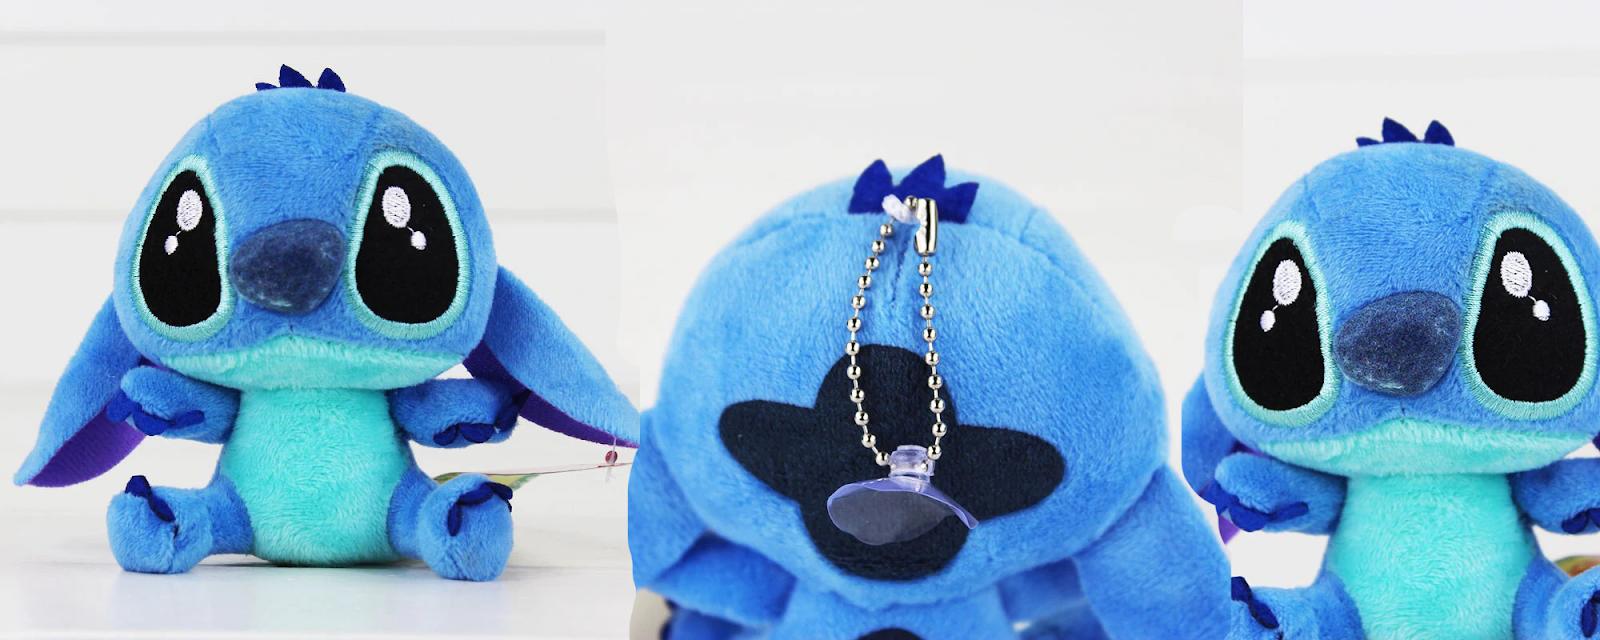 4/'/' 10cm Cute Lilo and Stitch Plush Toy Soft Touch Stuffed Doll Figure Kids Gift